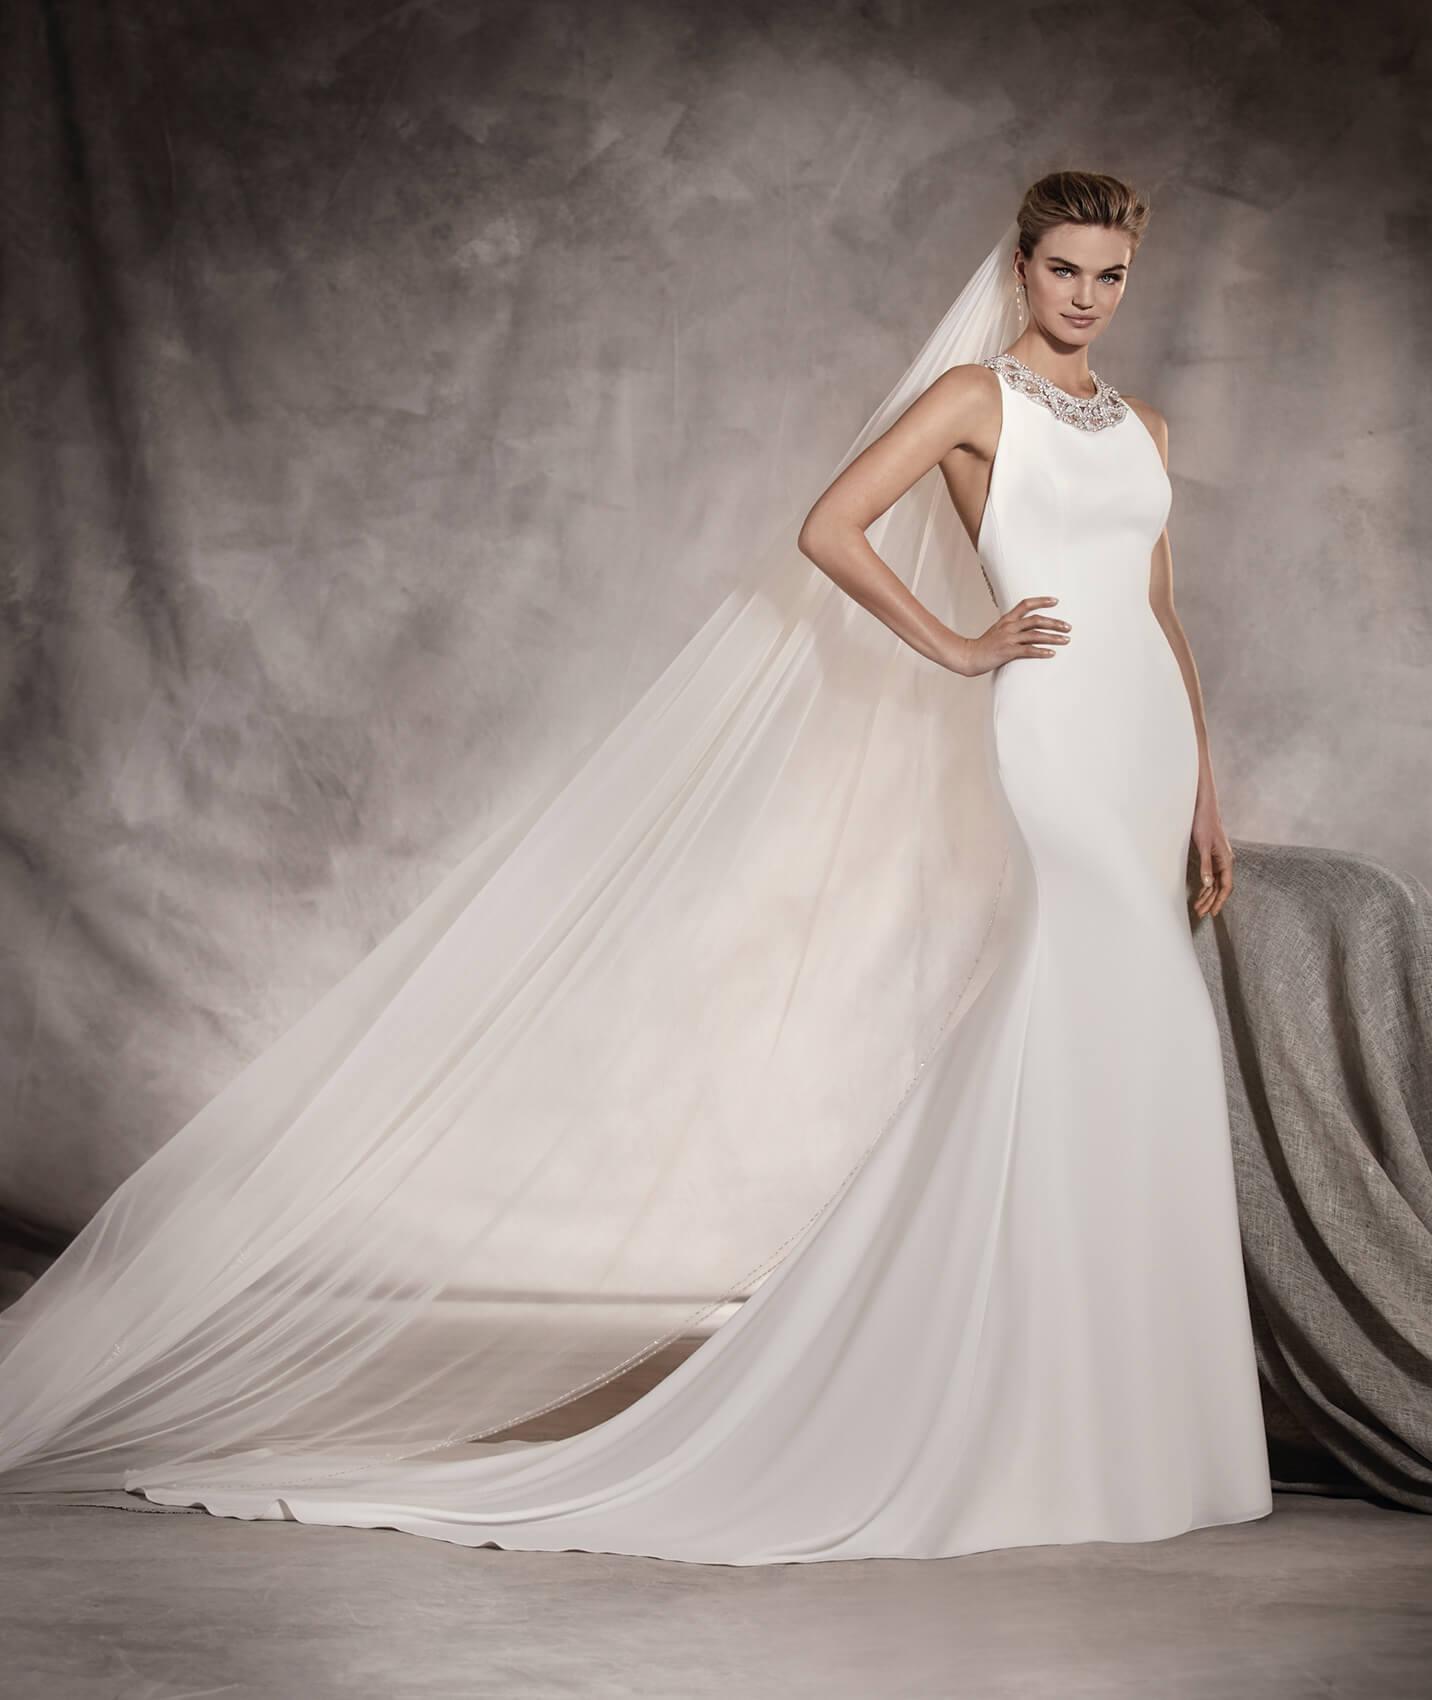 wedding dresses pronovia photo - 1